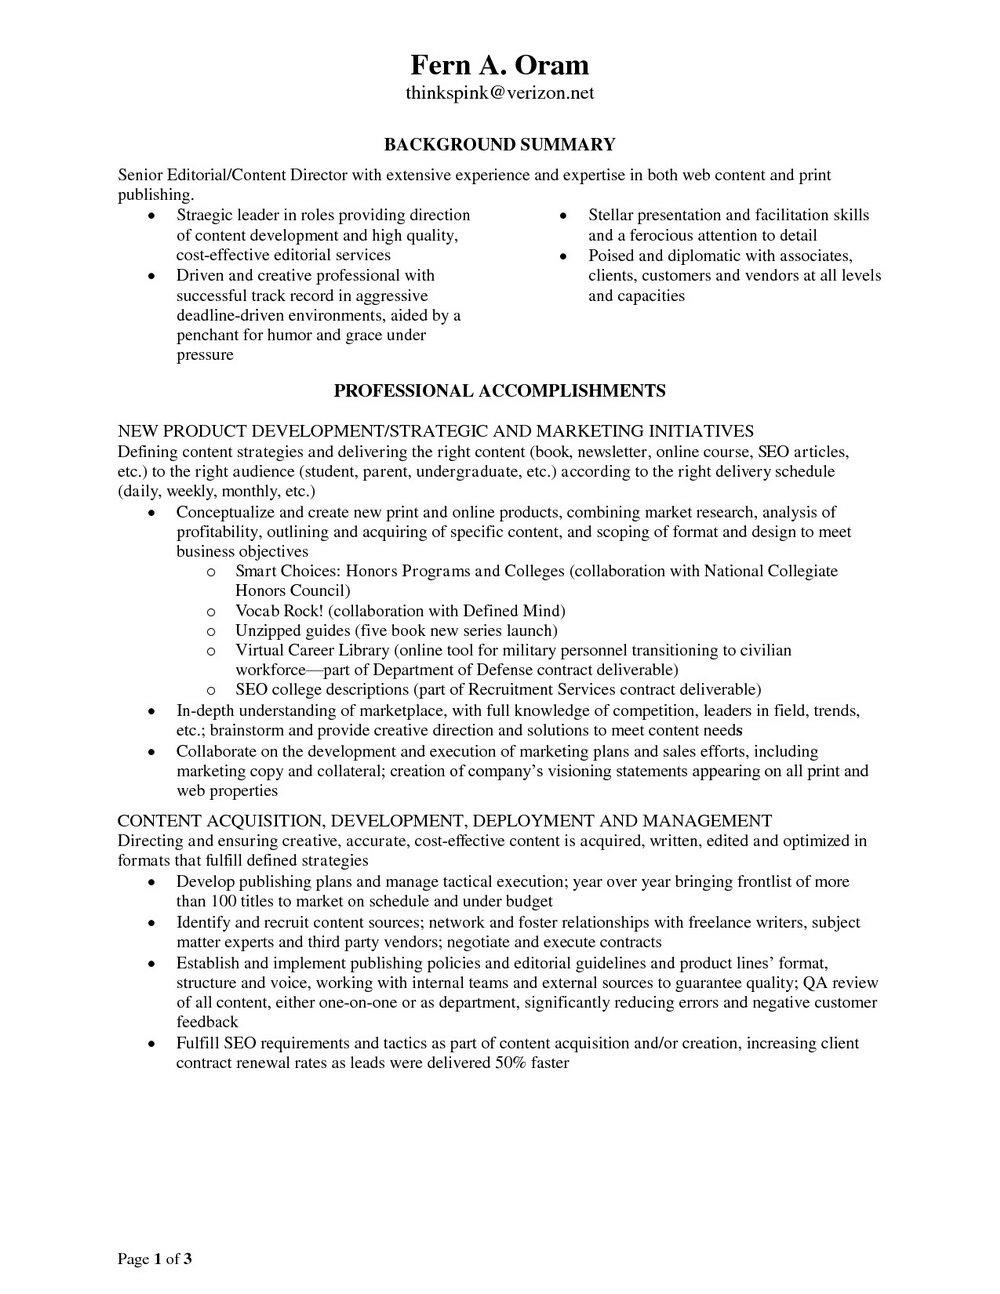 infosys site to upload resume